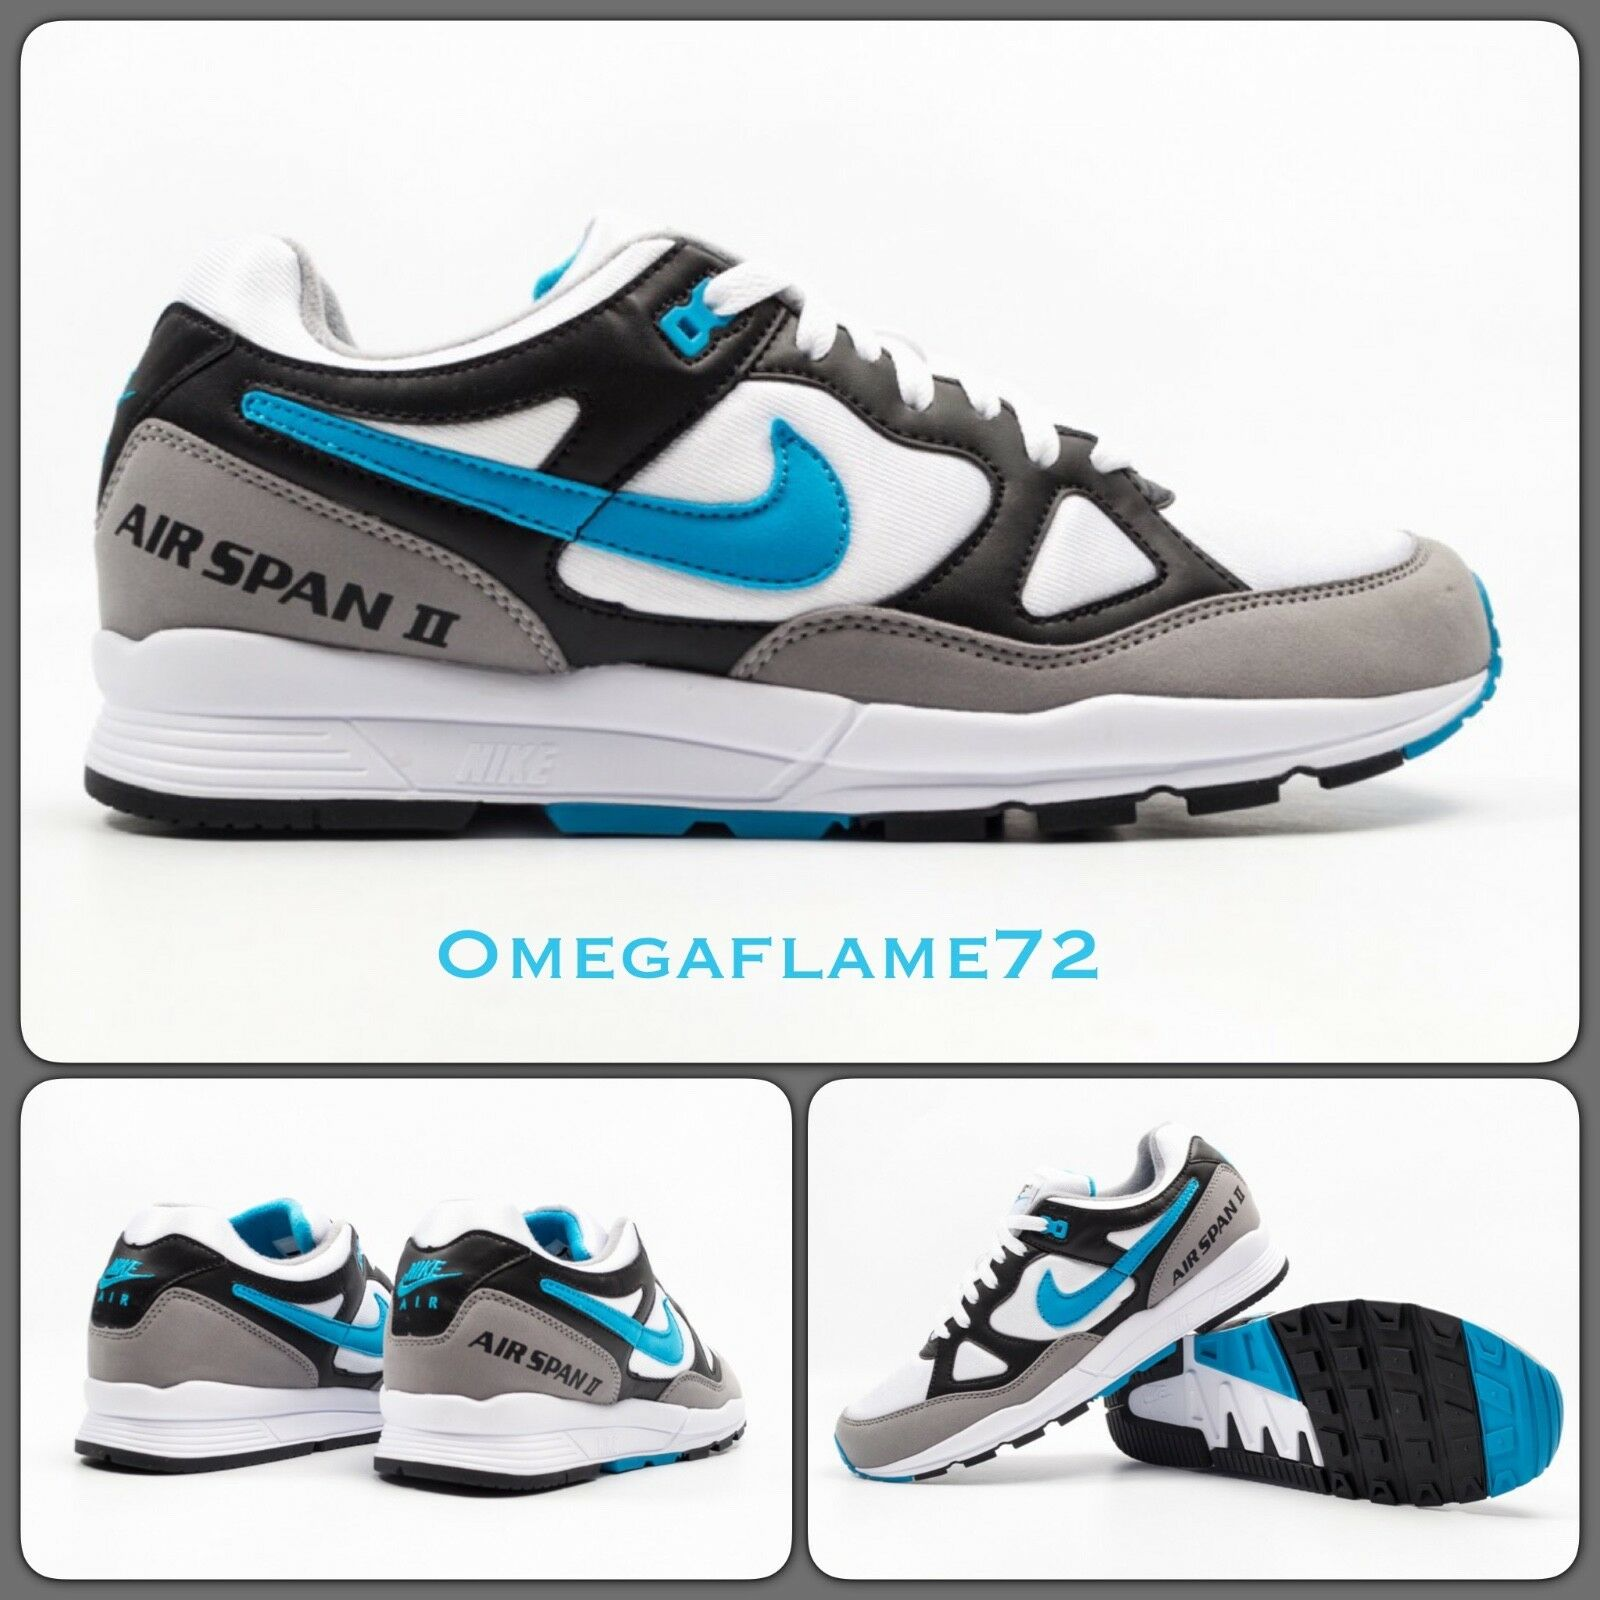 Nike Air Span II 2 og, UK 10.5, EU 45.5, US 11.5, AH8047-001 Laser Bleu & Blanc